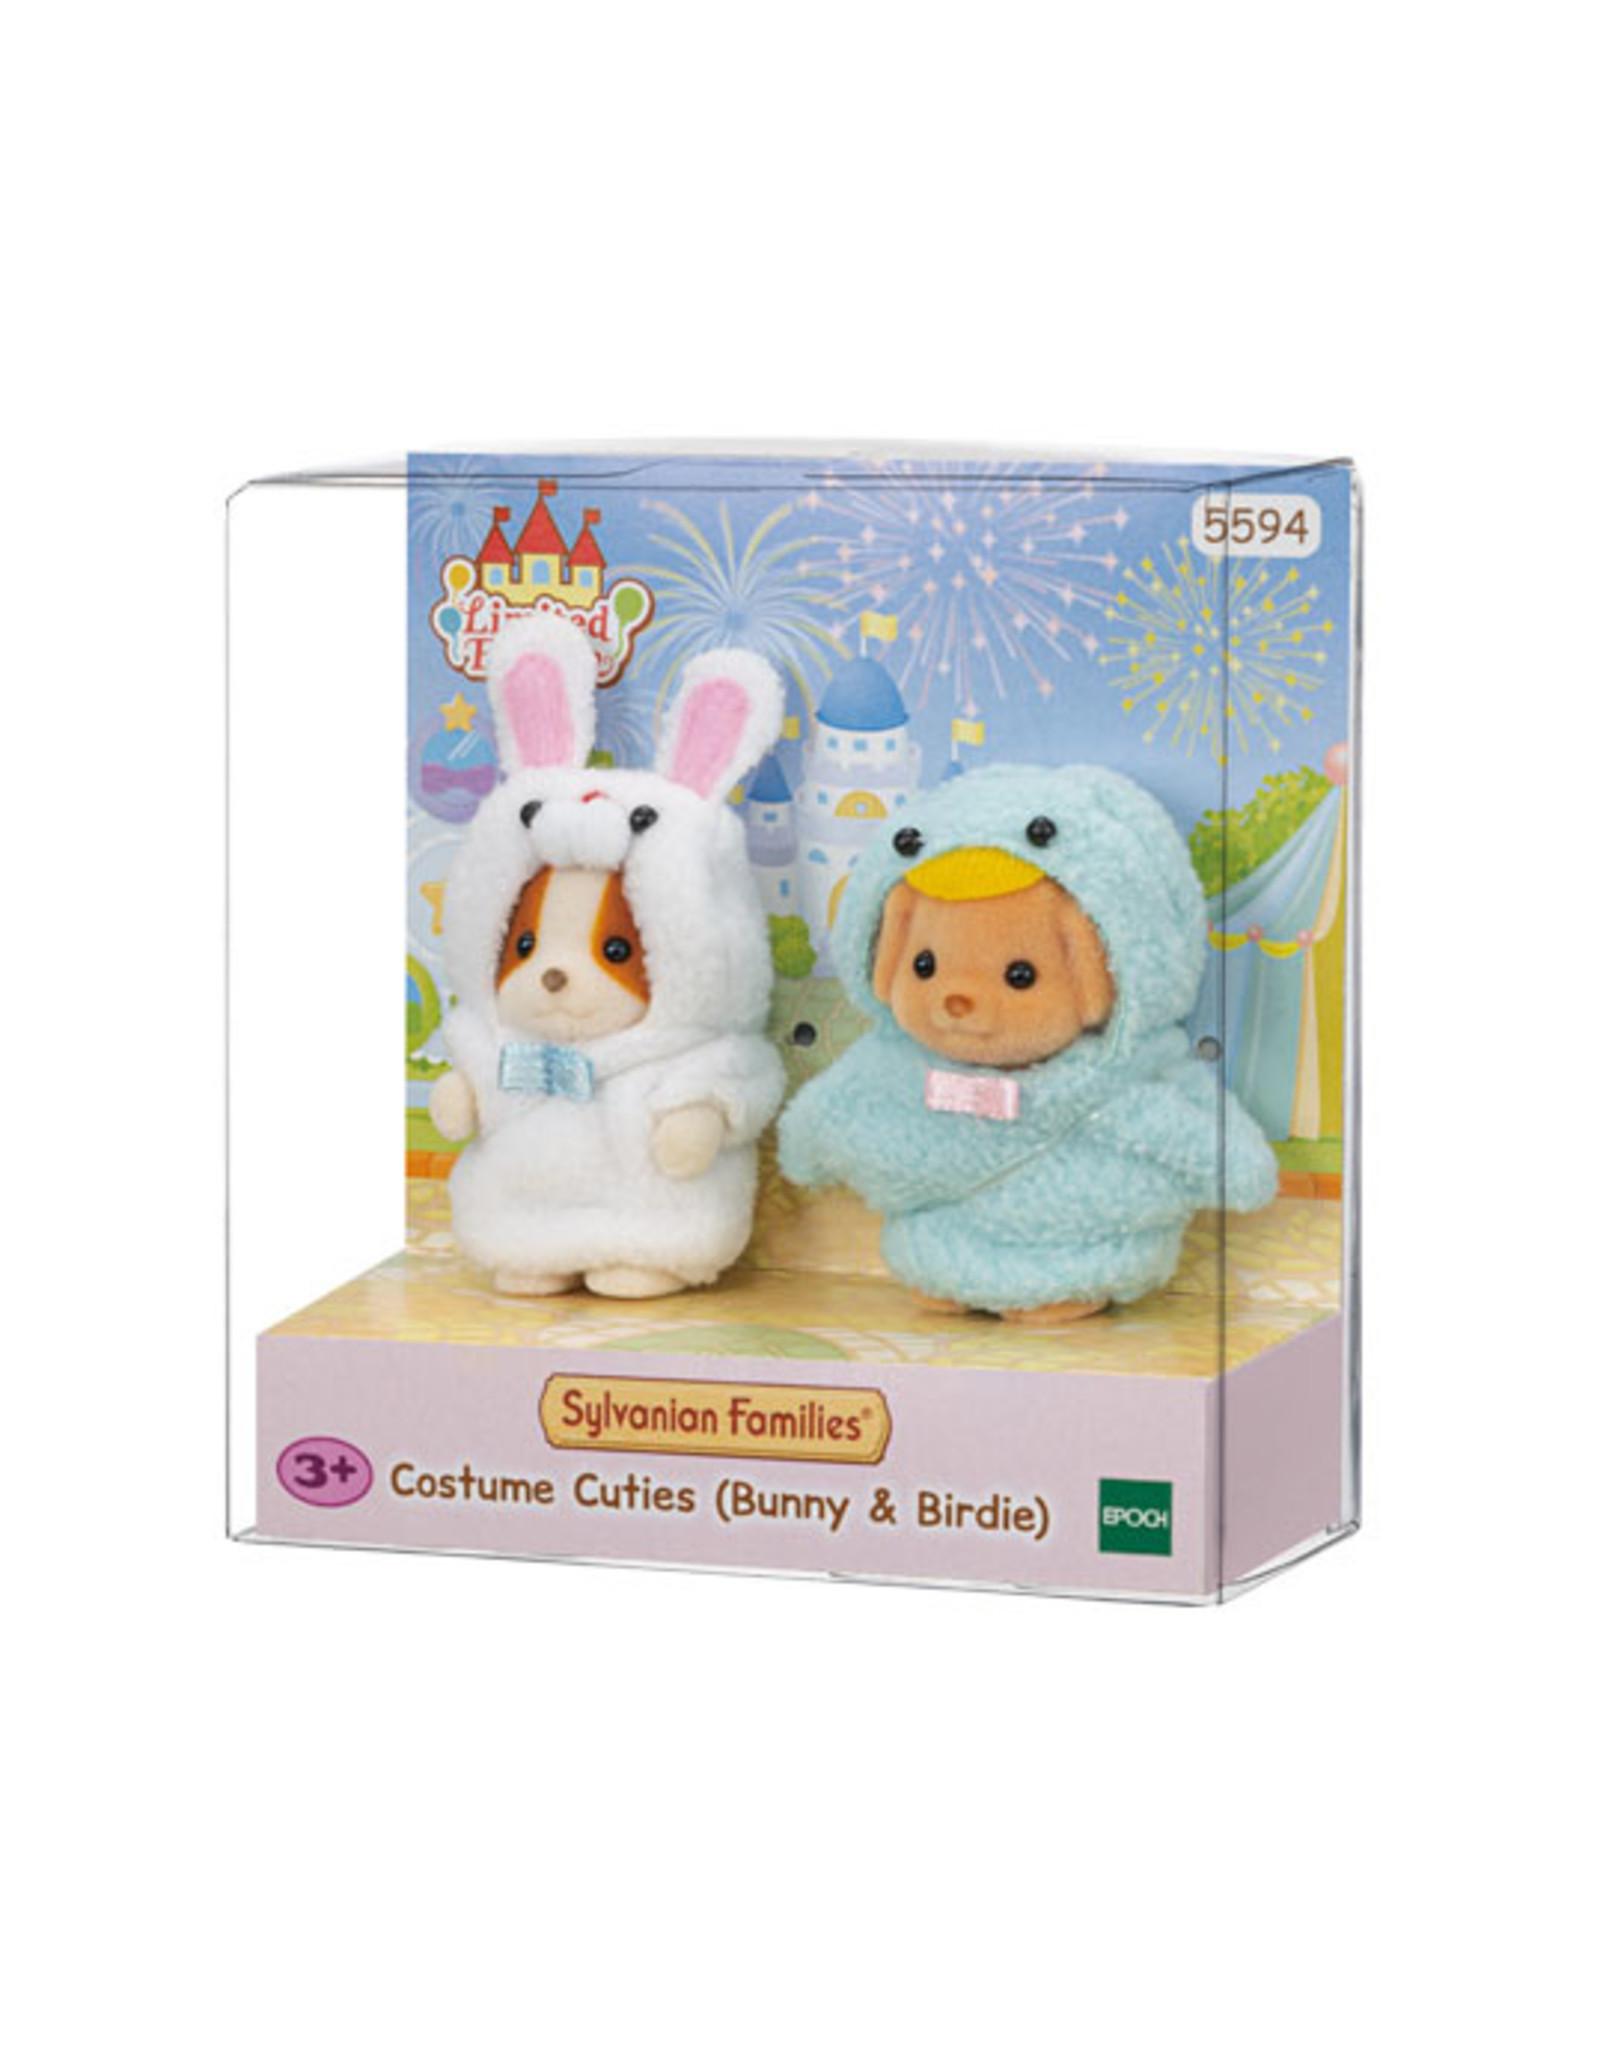 Sylvanian Families Costume Cuties  (Bunny & Birdie)